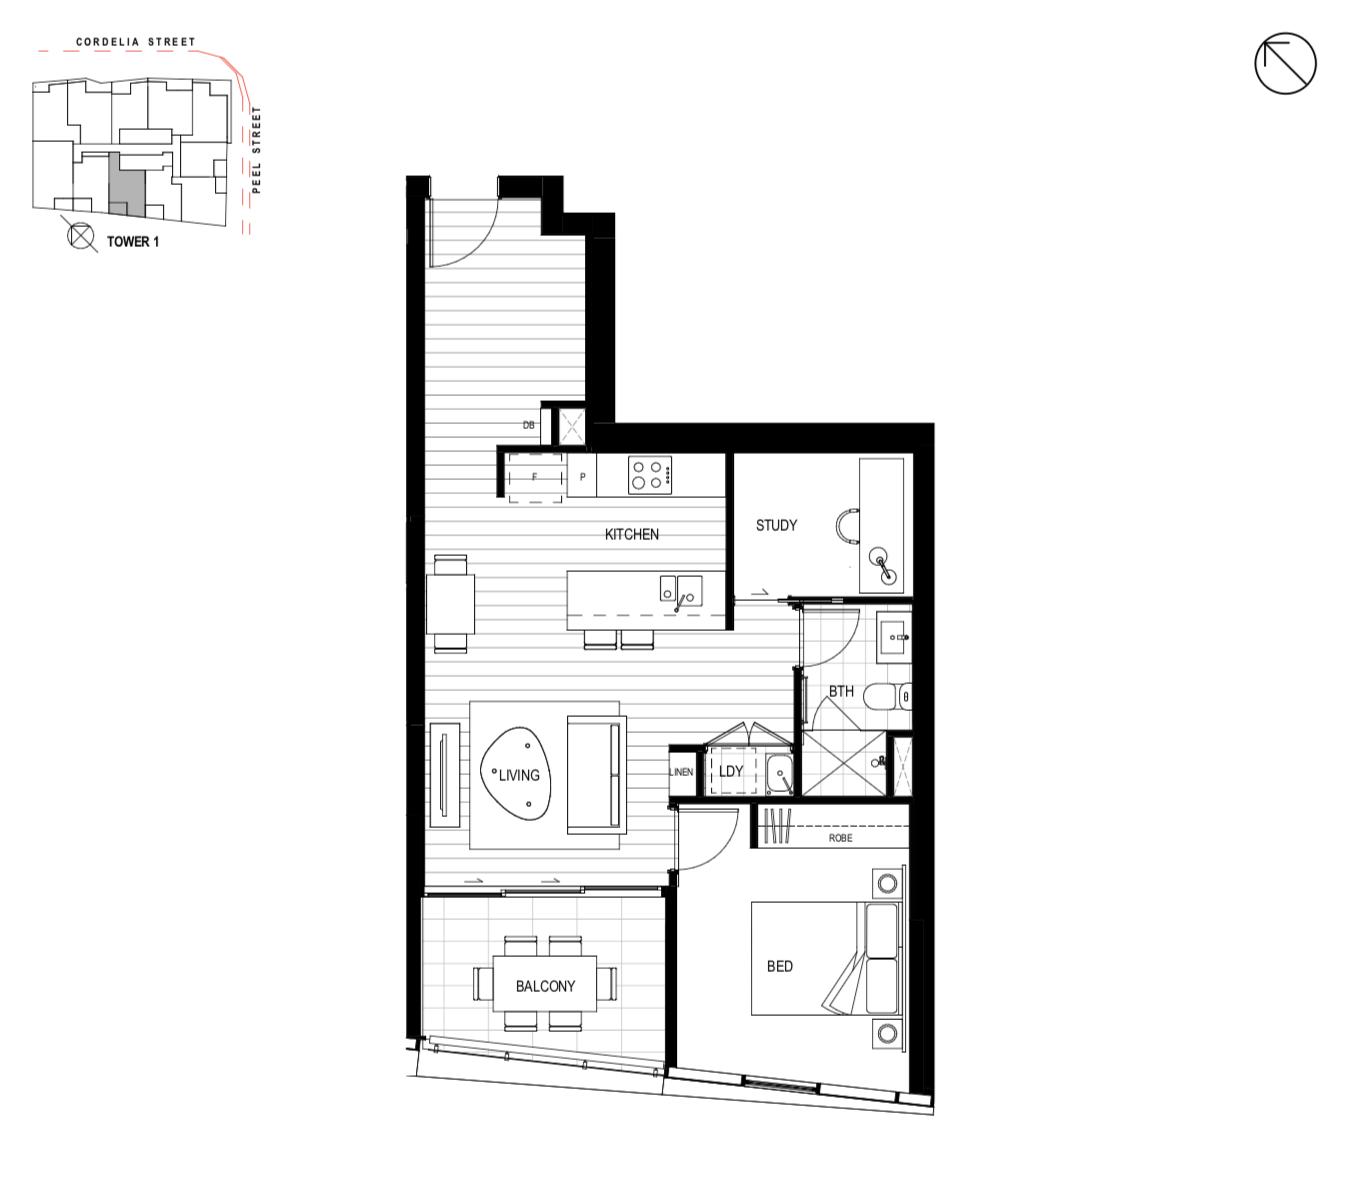 Tower 1 Unit 2301 - 1 Bedroom